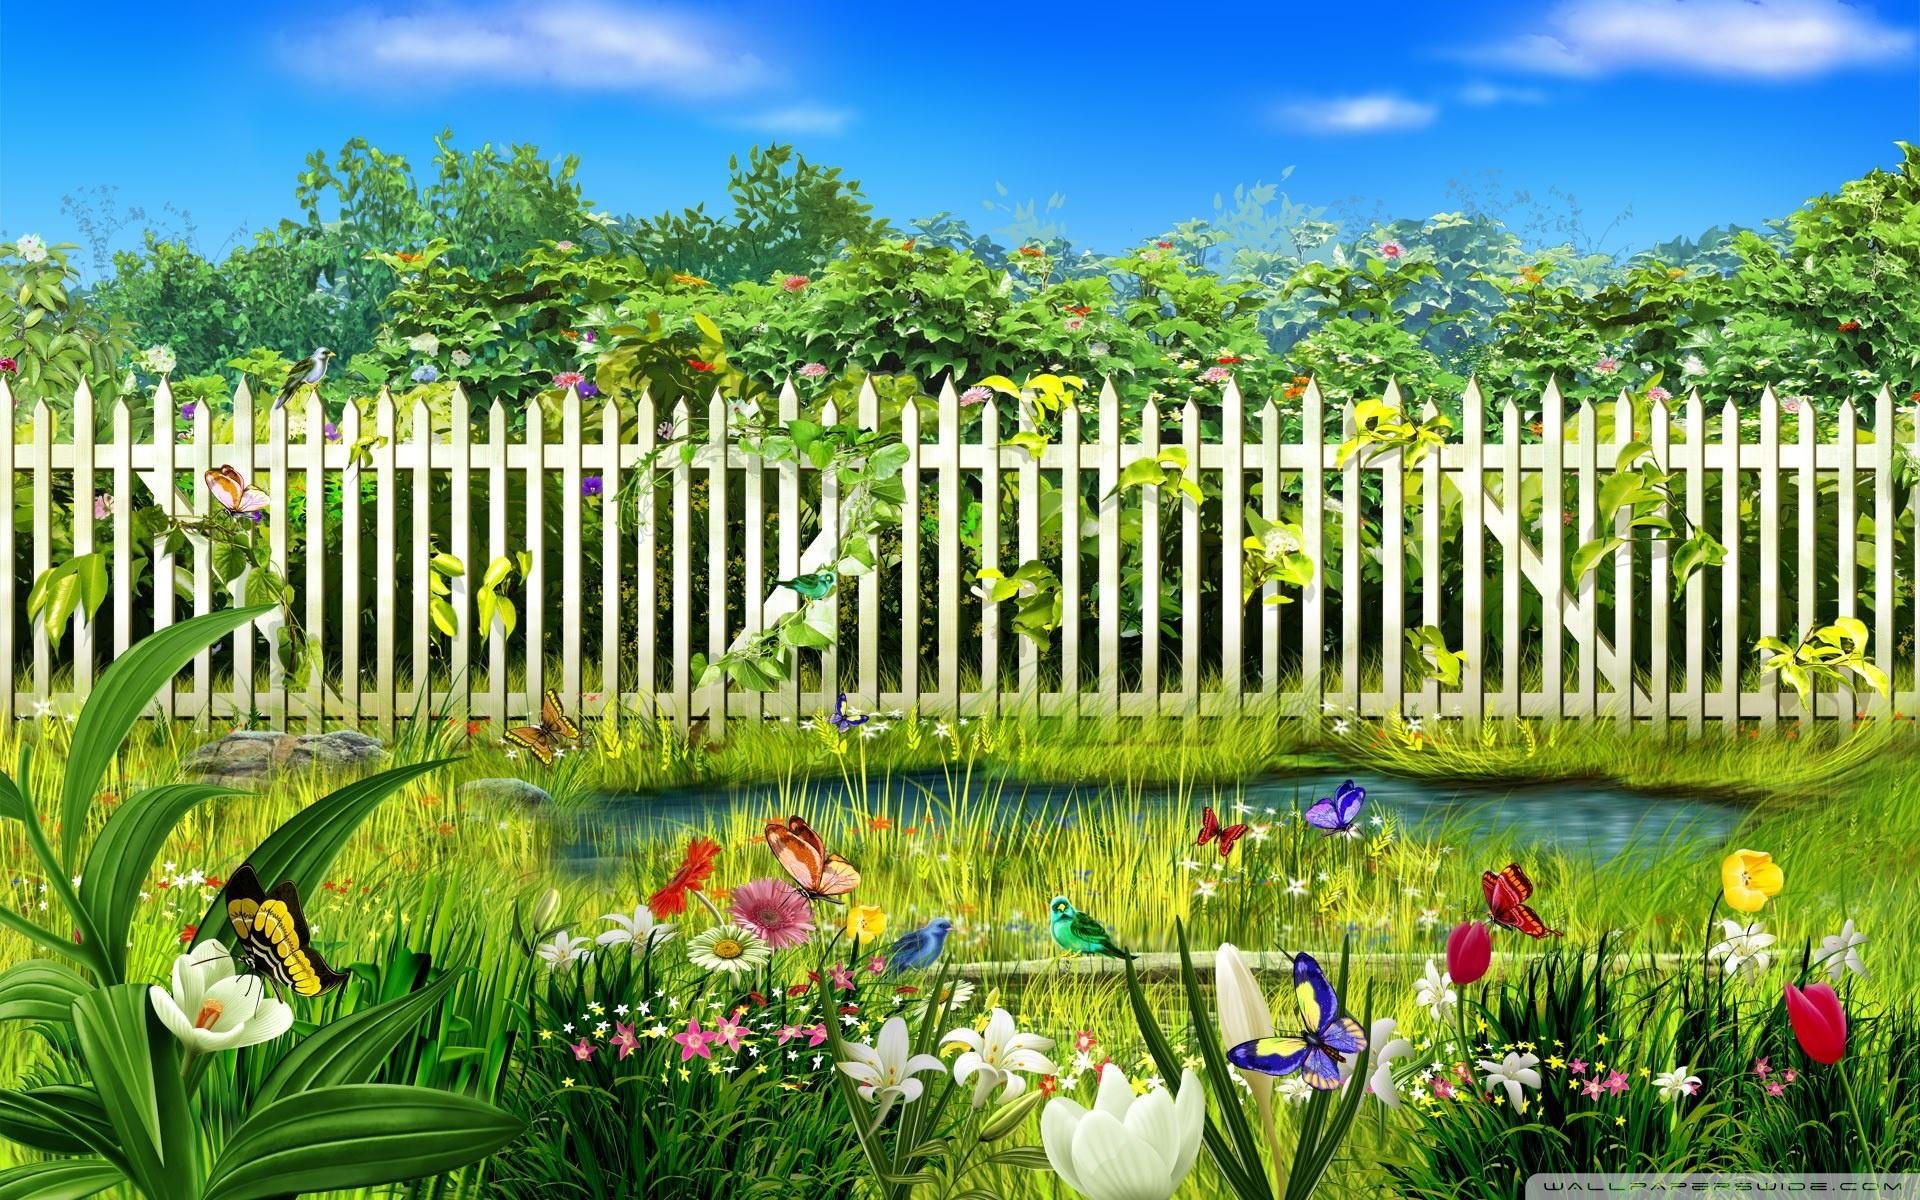 Spring Garden 4K HD Desktop Wallpaper for 4K Ultra HD TV 1920x1200